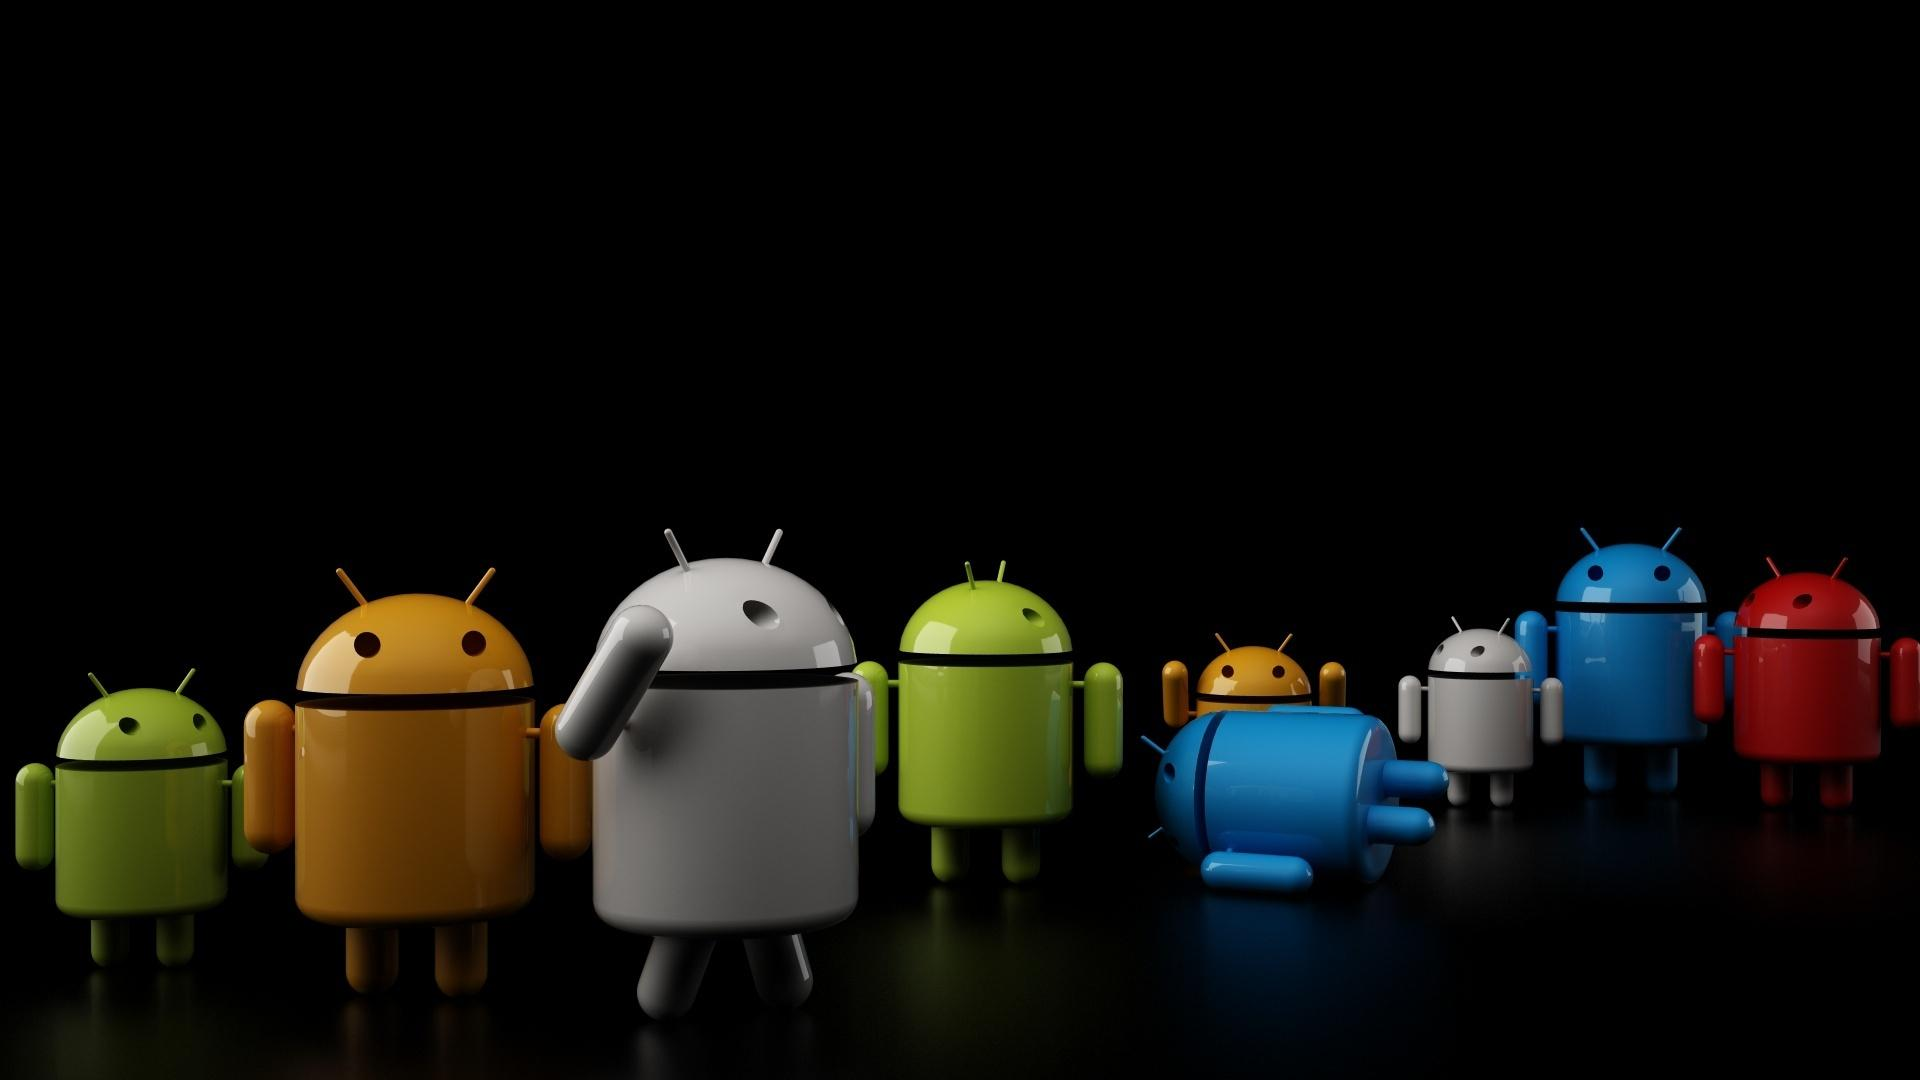 Скачать обои Android, Андроид,